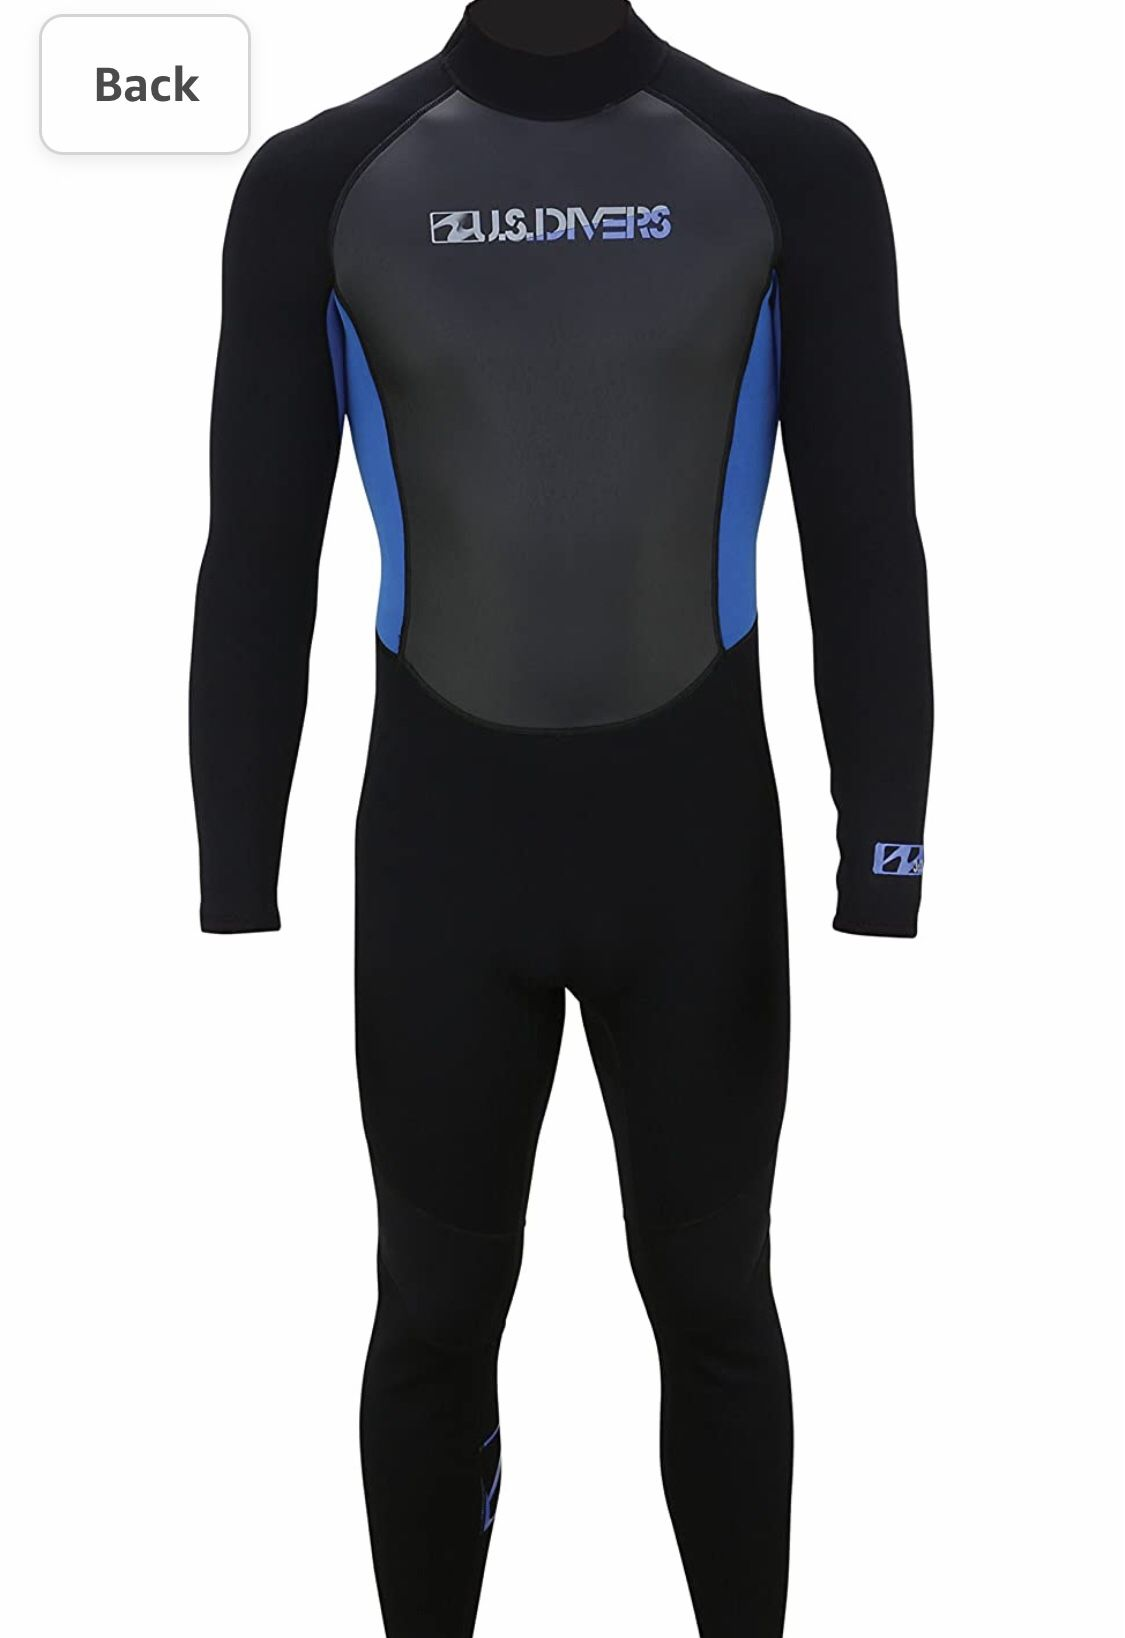 U.S. Divers 3.2mm Adult Full Wetsuit, Black/Blue